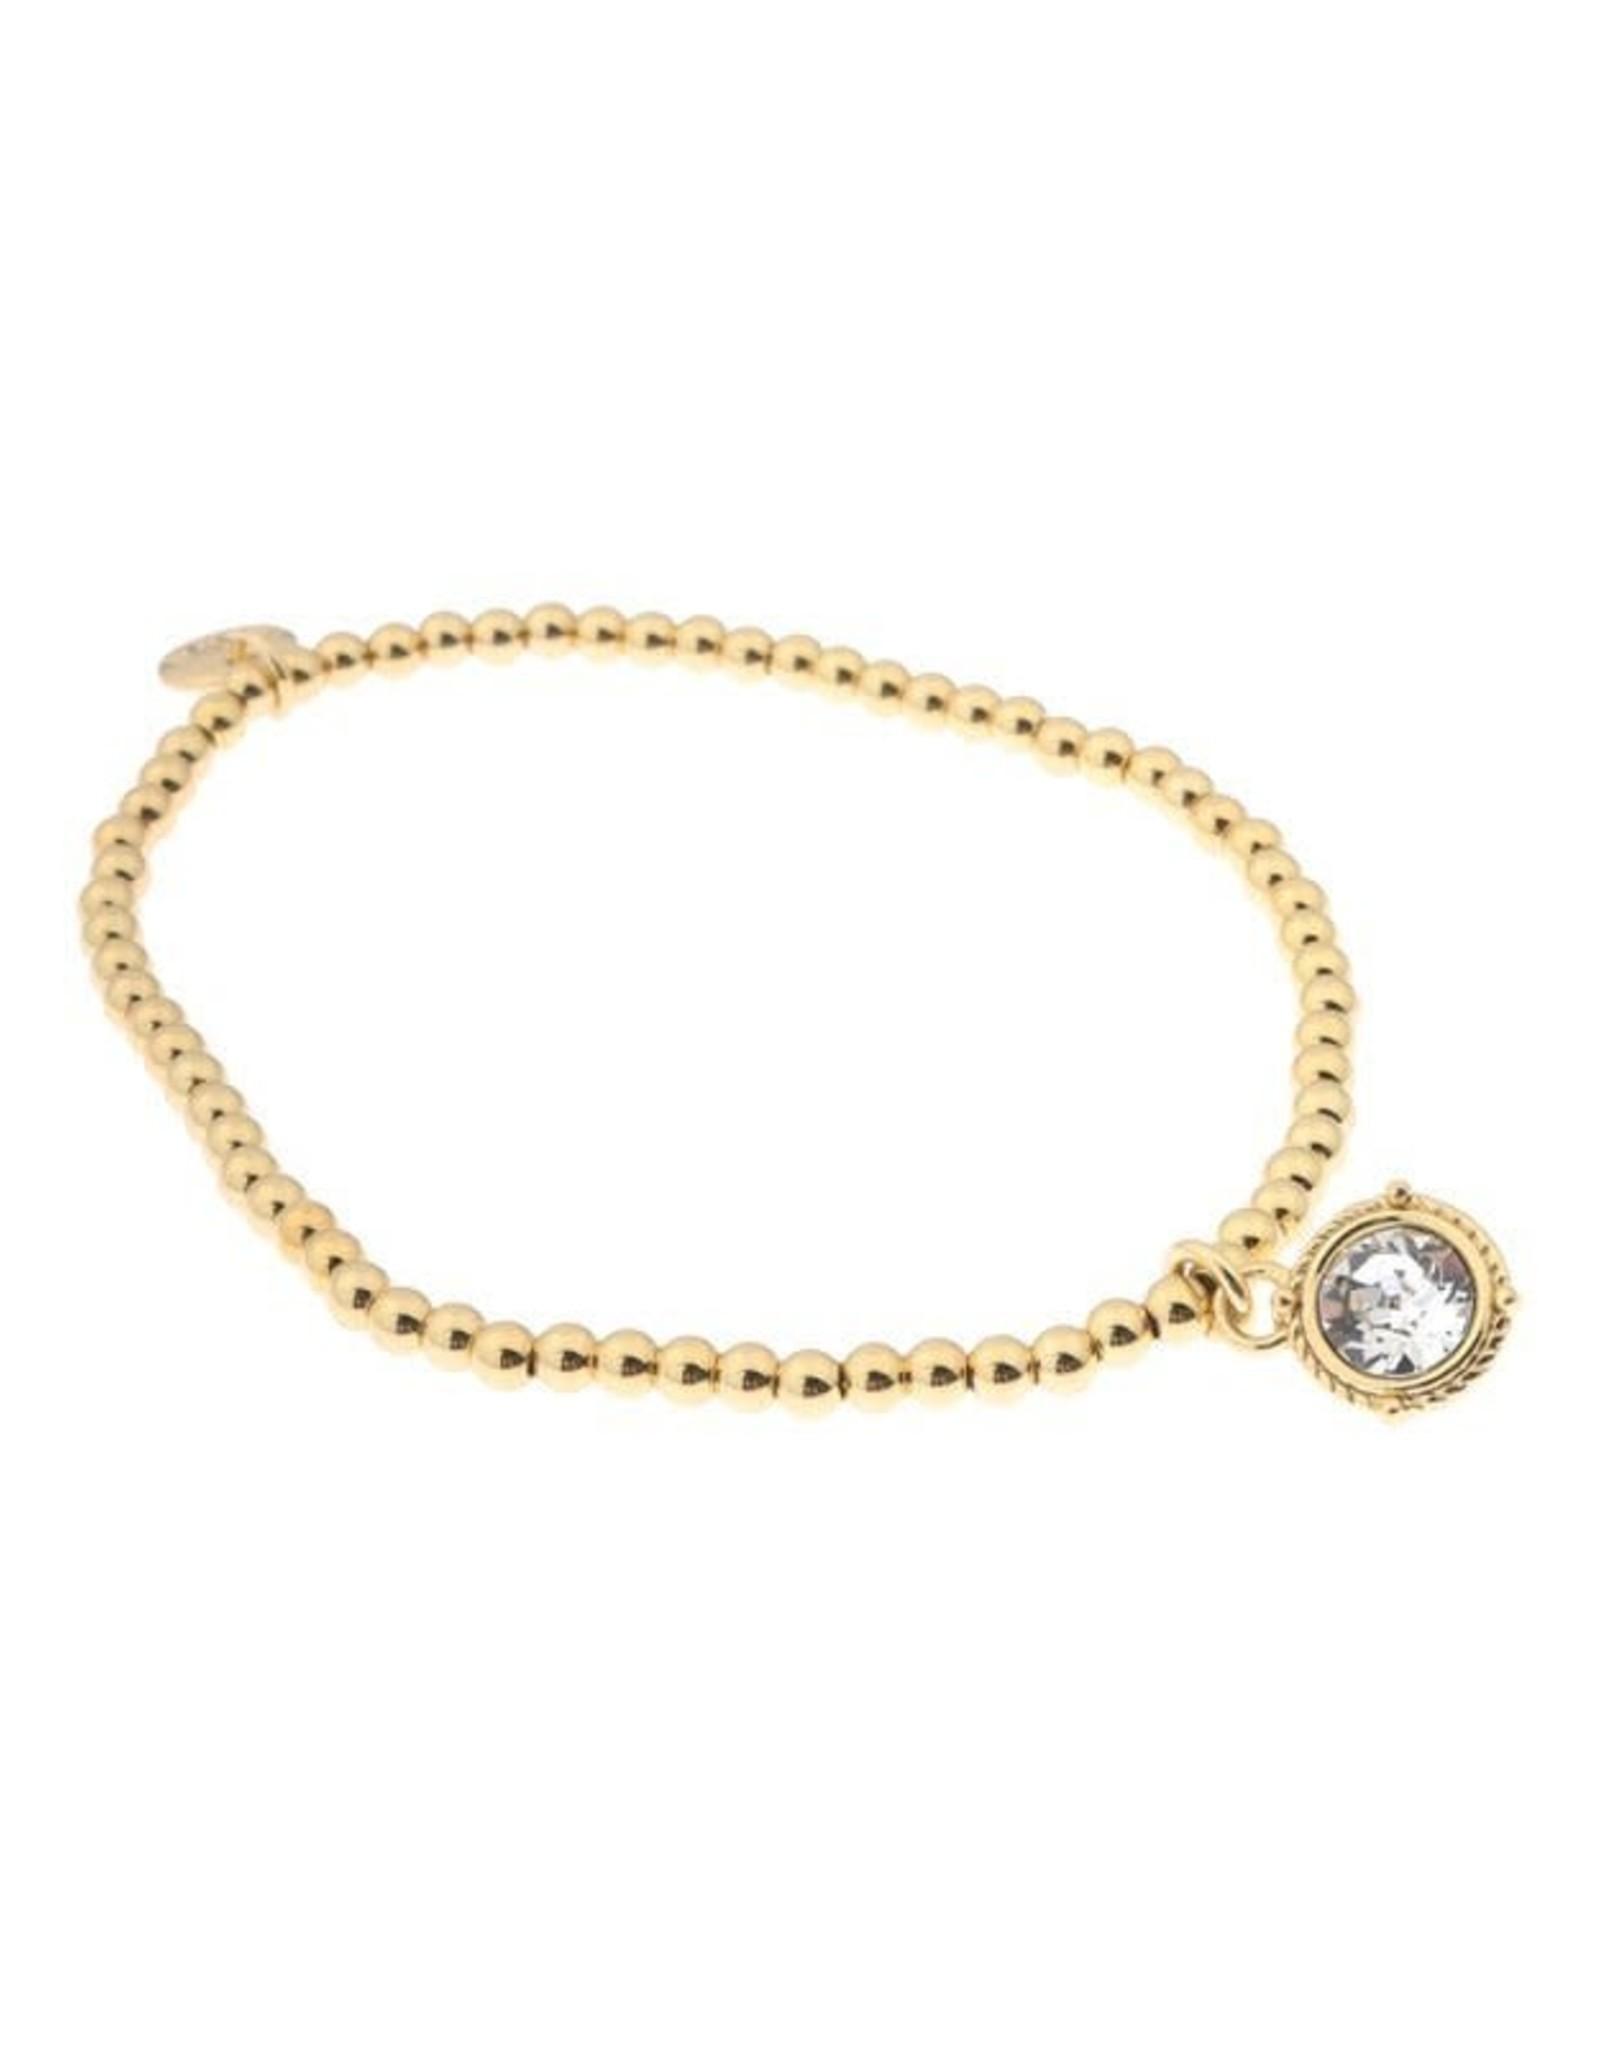 Biba Biba armband met swarovski steen crystal